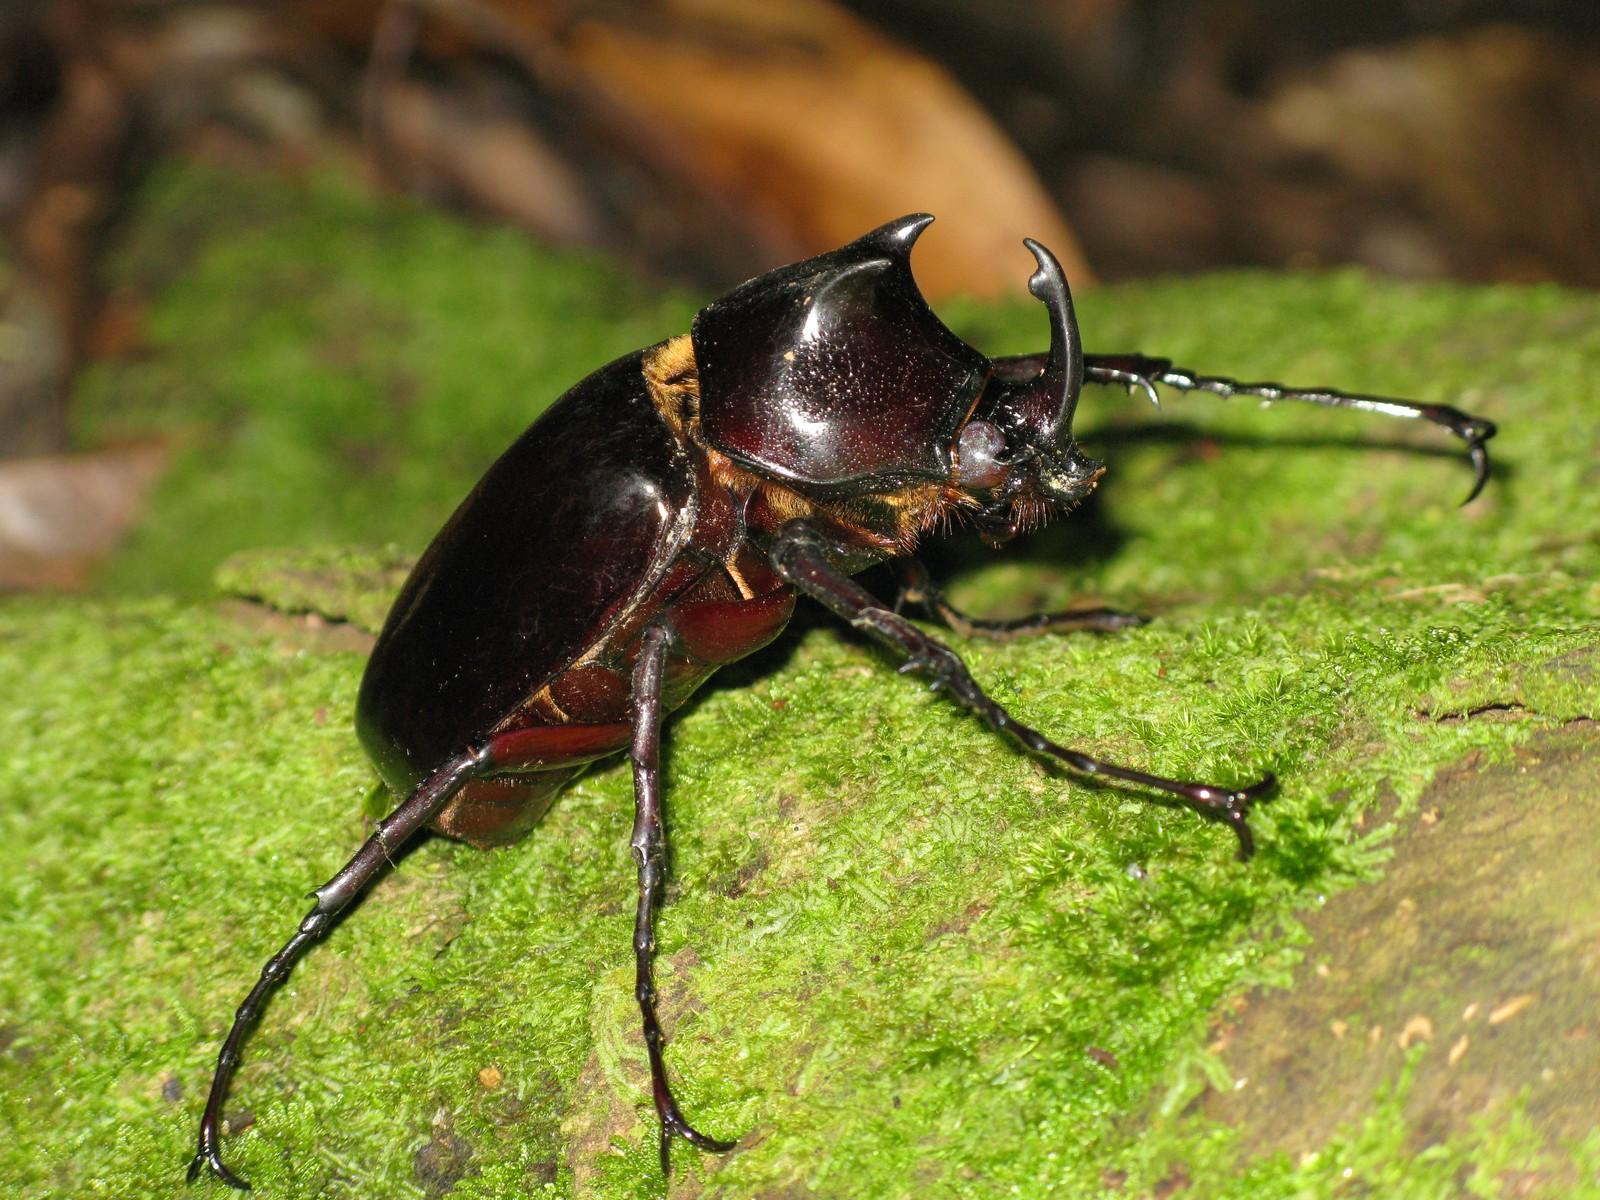 Coleoptera (Beetles): Scarabaeidae